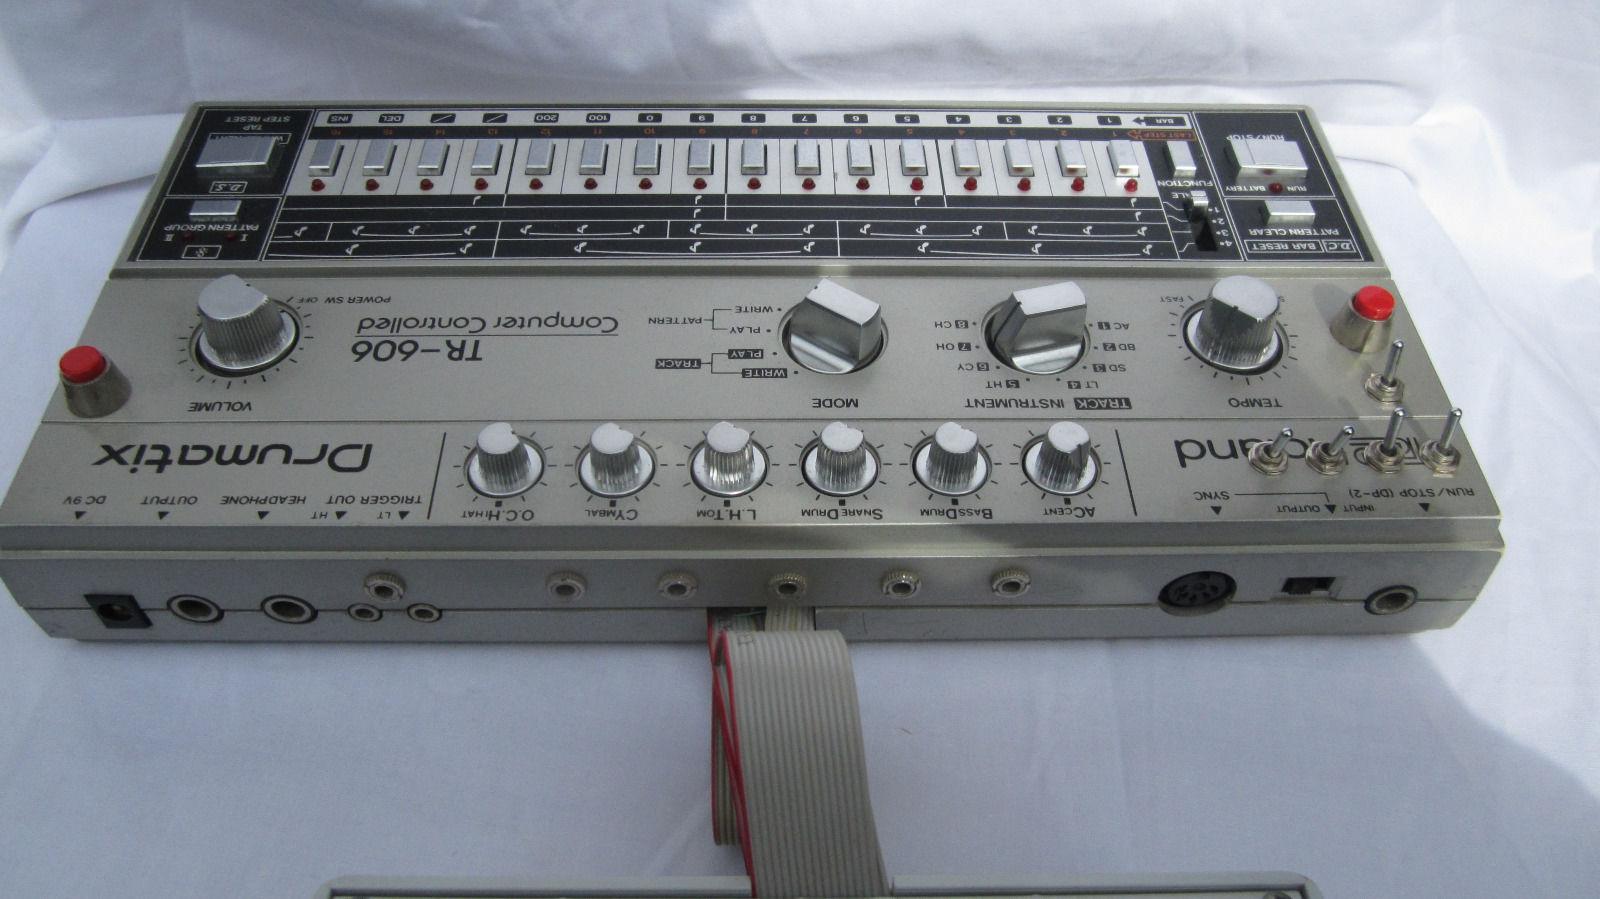 matrixsynth roland tr 606 drumatix drum machine with mods. Black Bedroom Furniture Sets. Home Design Ideas